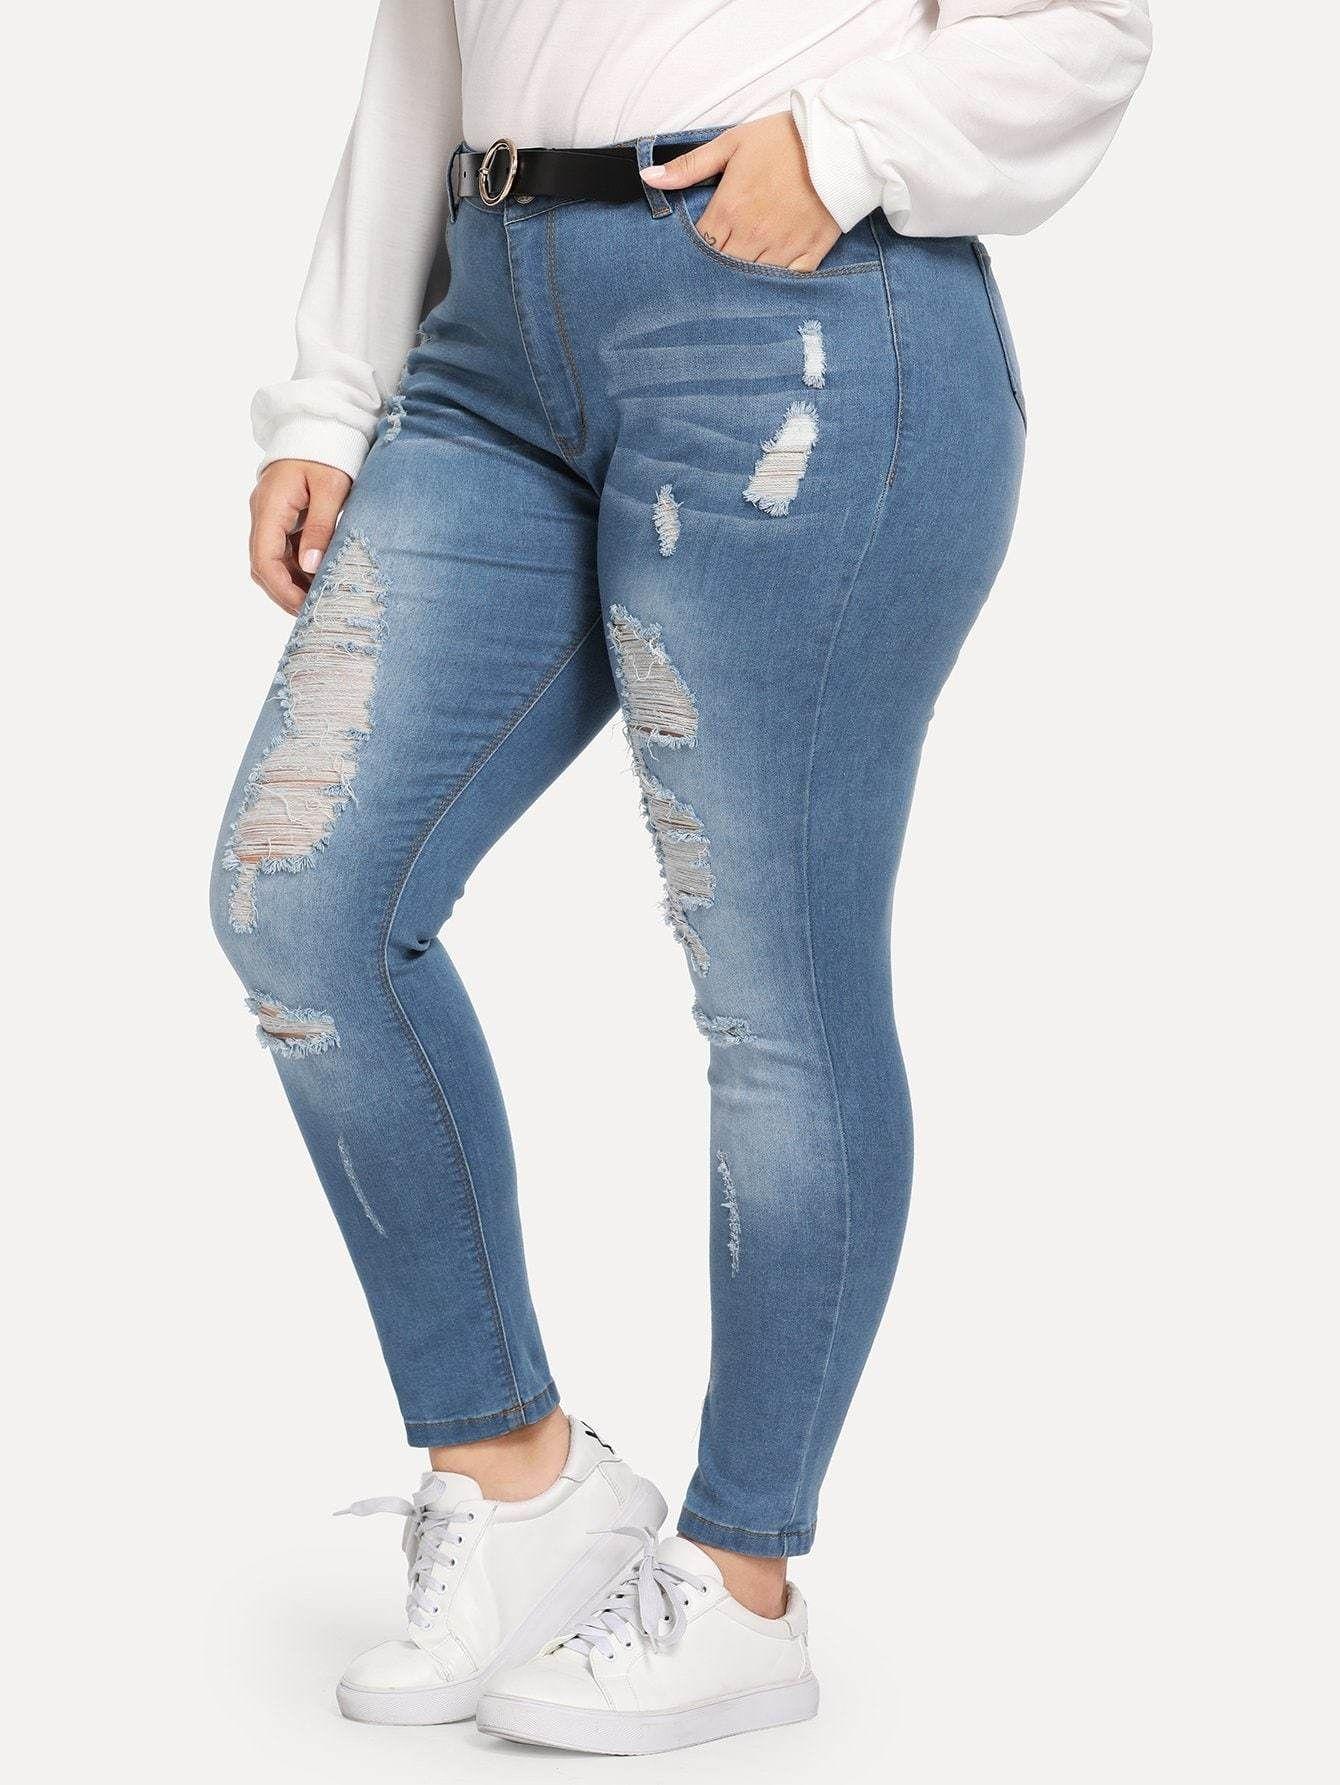 Pin en Jeans Mujer Tallas Grandes